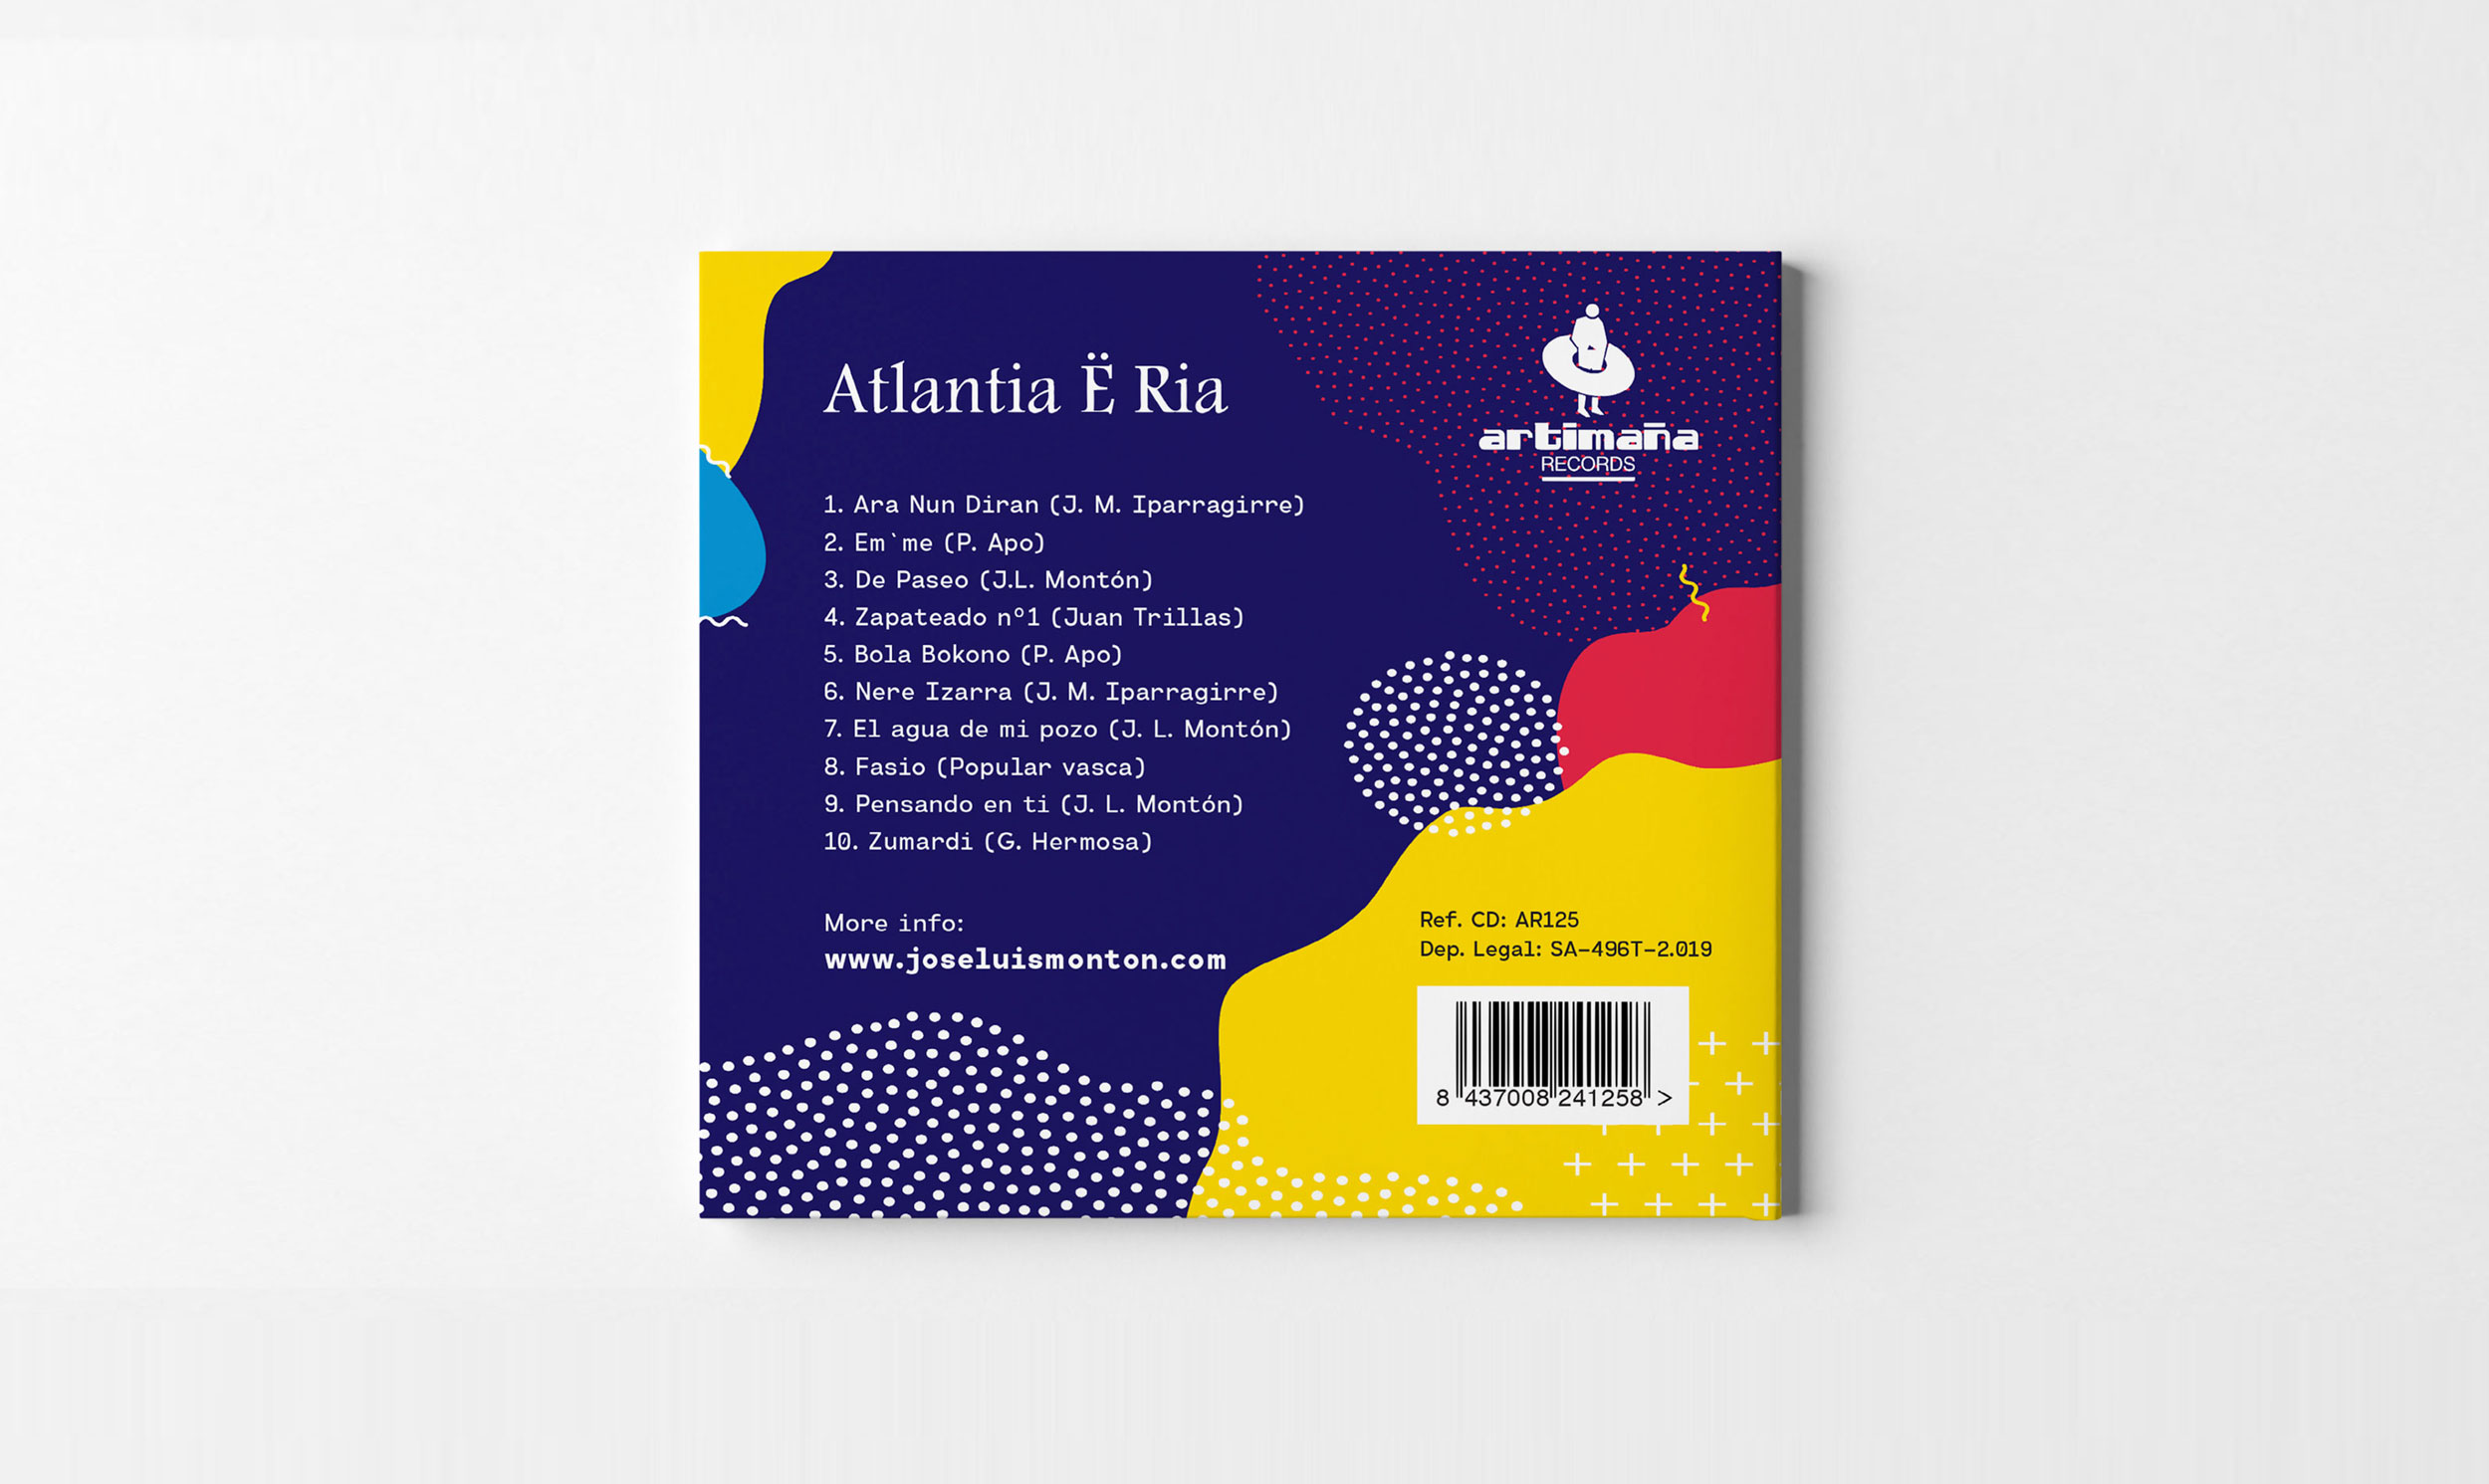 contra-atlantia-10